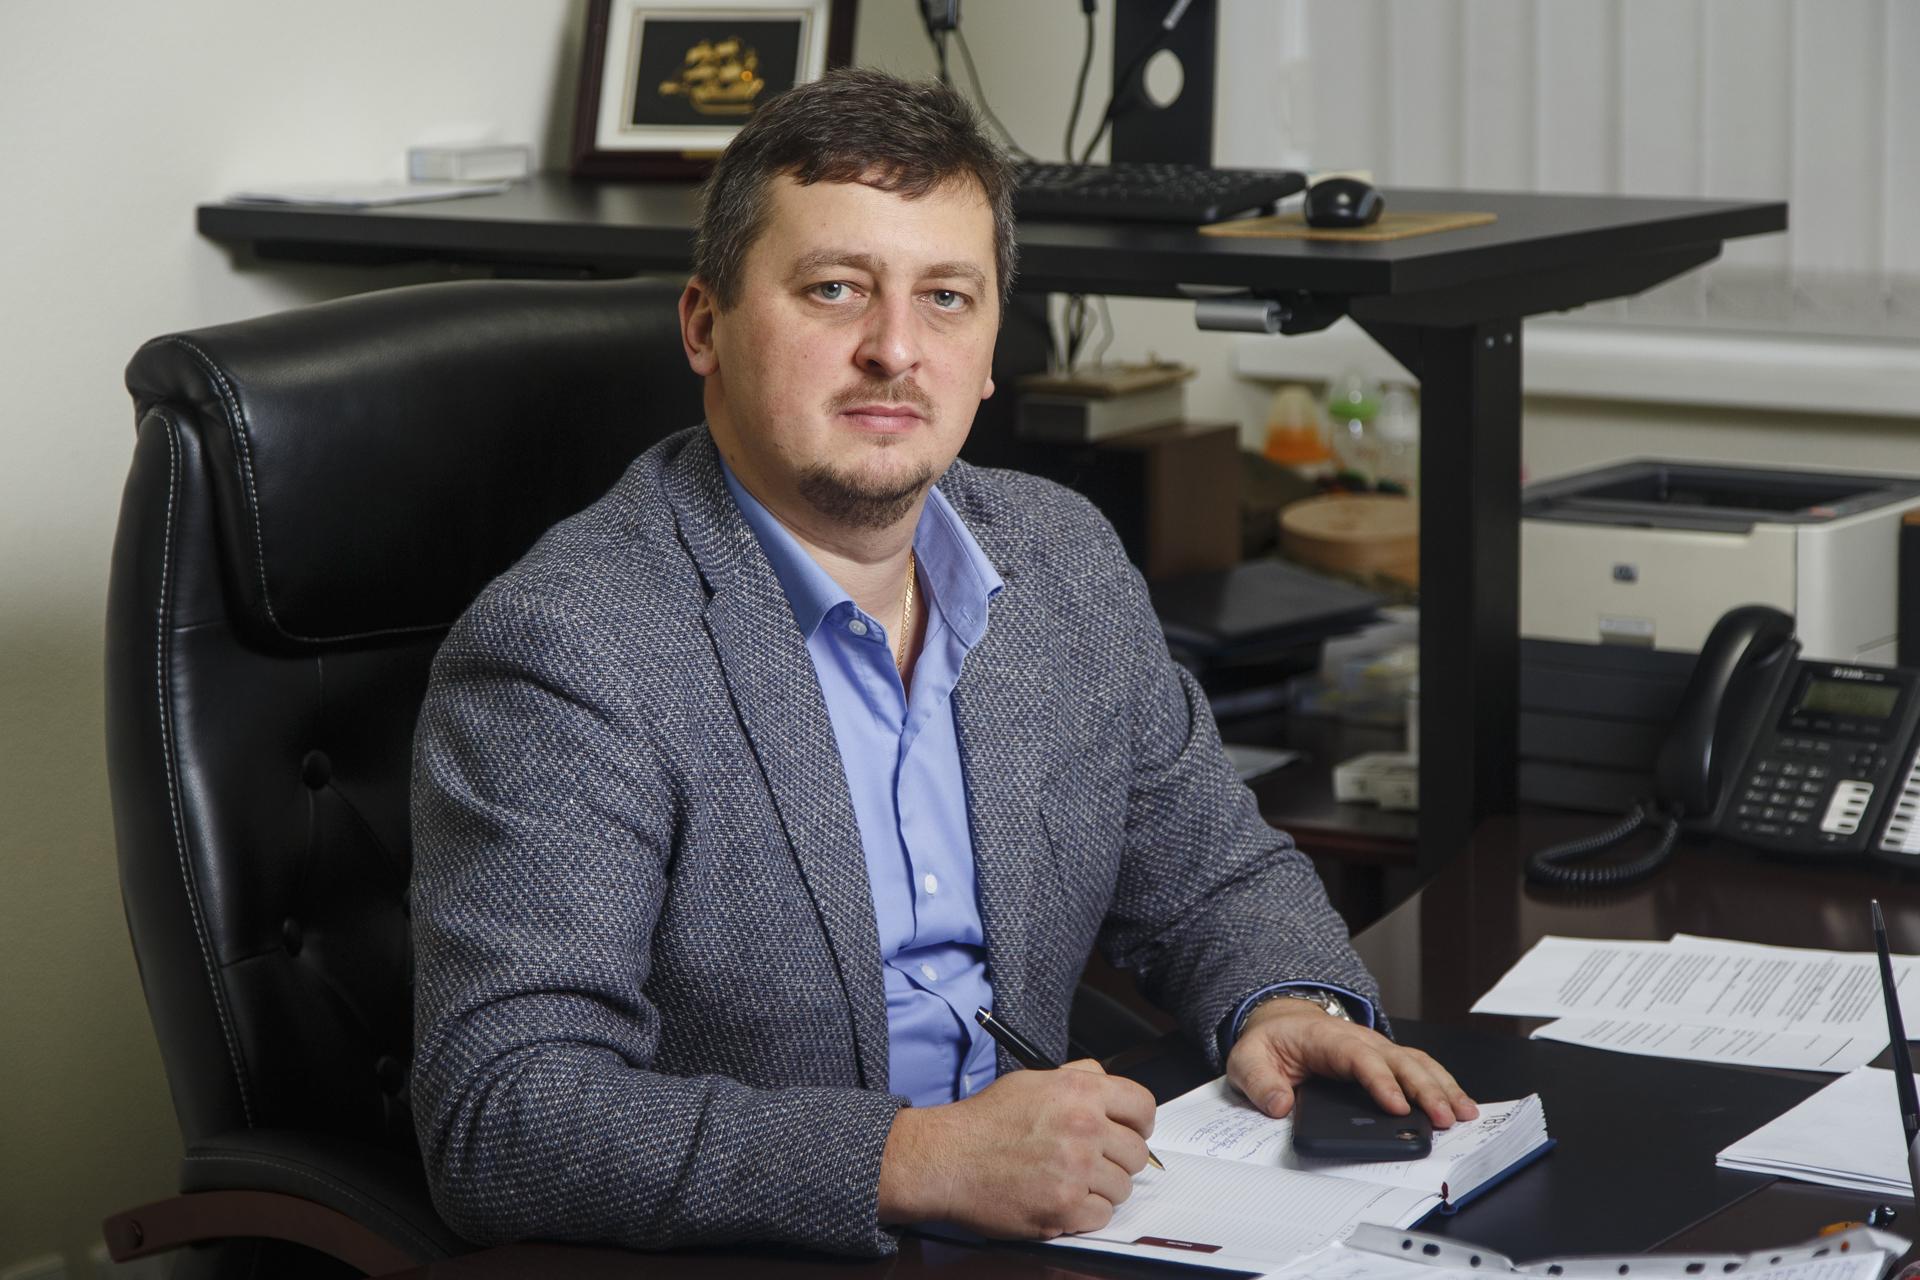 Corona crisis: Adapting business to the new challenges – a case study with Ukrainian manufacturer Kievguma